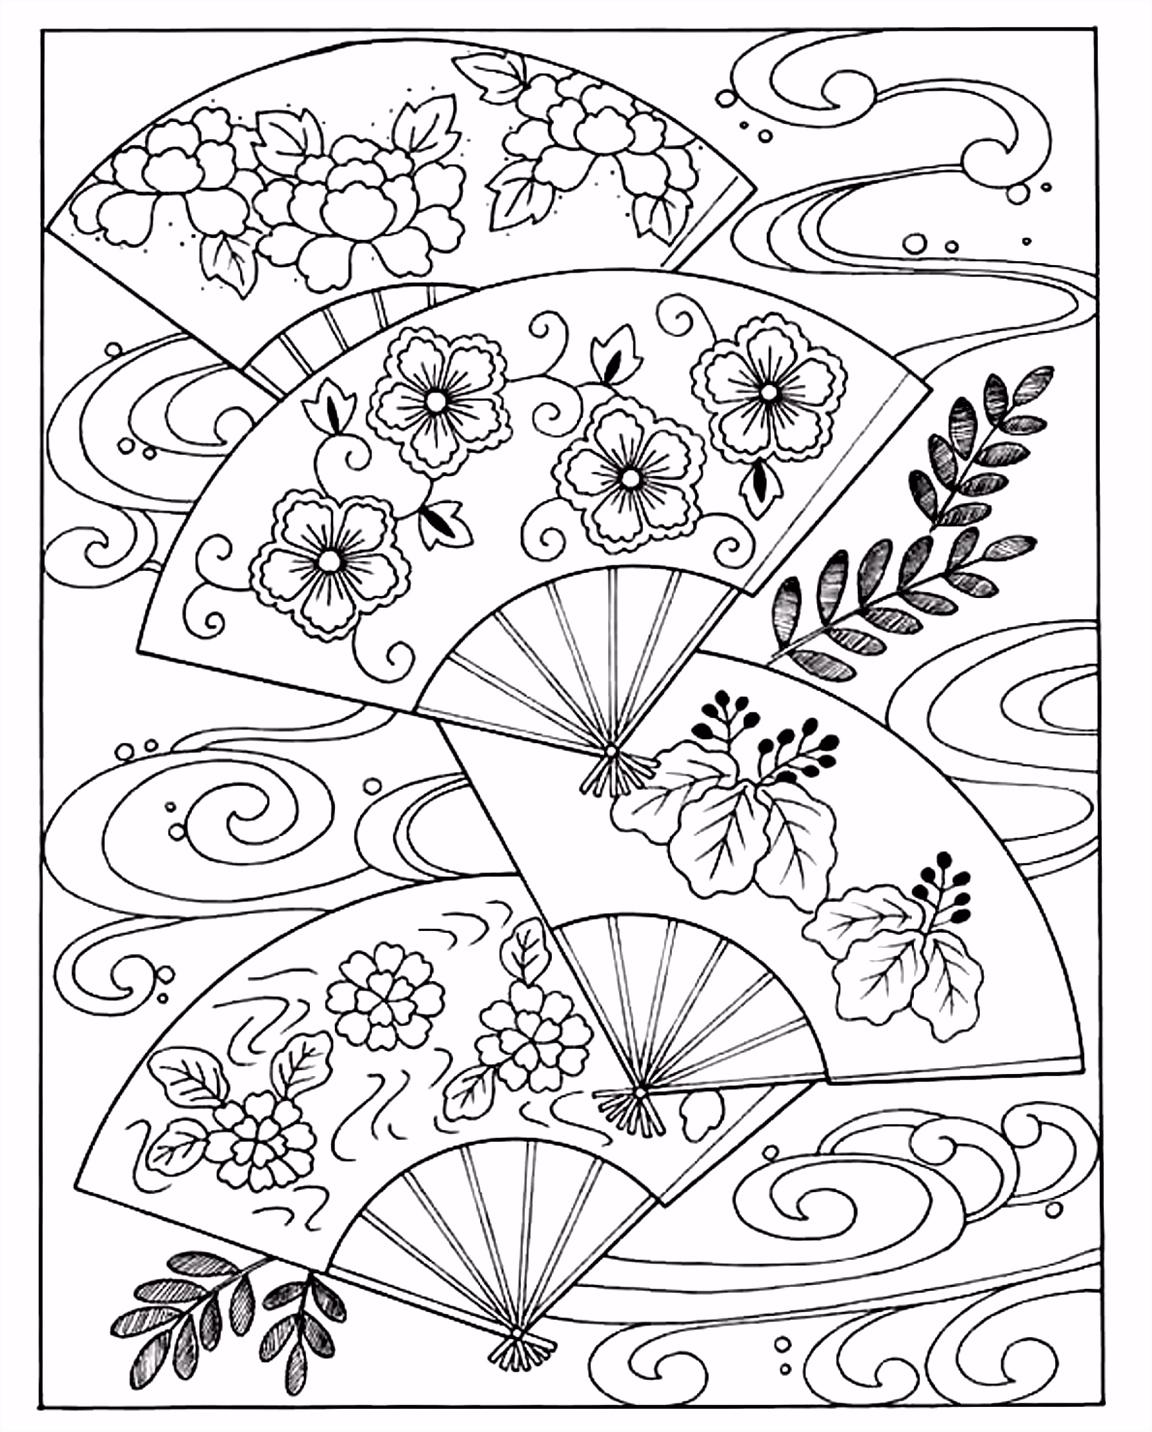 Kleurplaten Magische Doremi Free Coloring Page Coloring Japanese Hand Fan Coloring Japanese J2nd62eyx3 I6yws6esb0